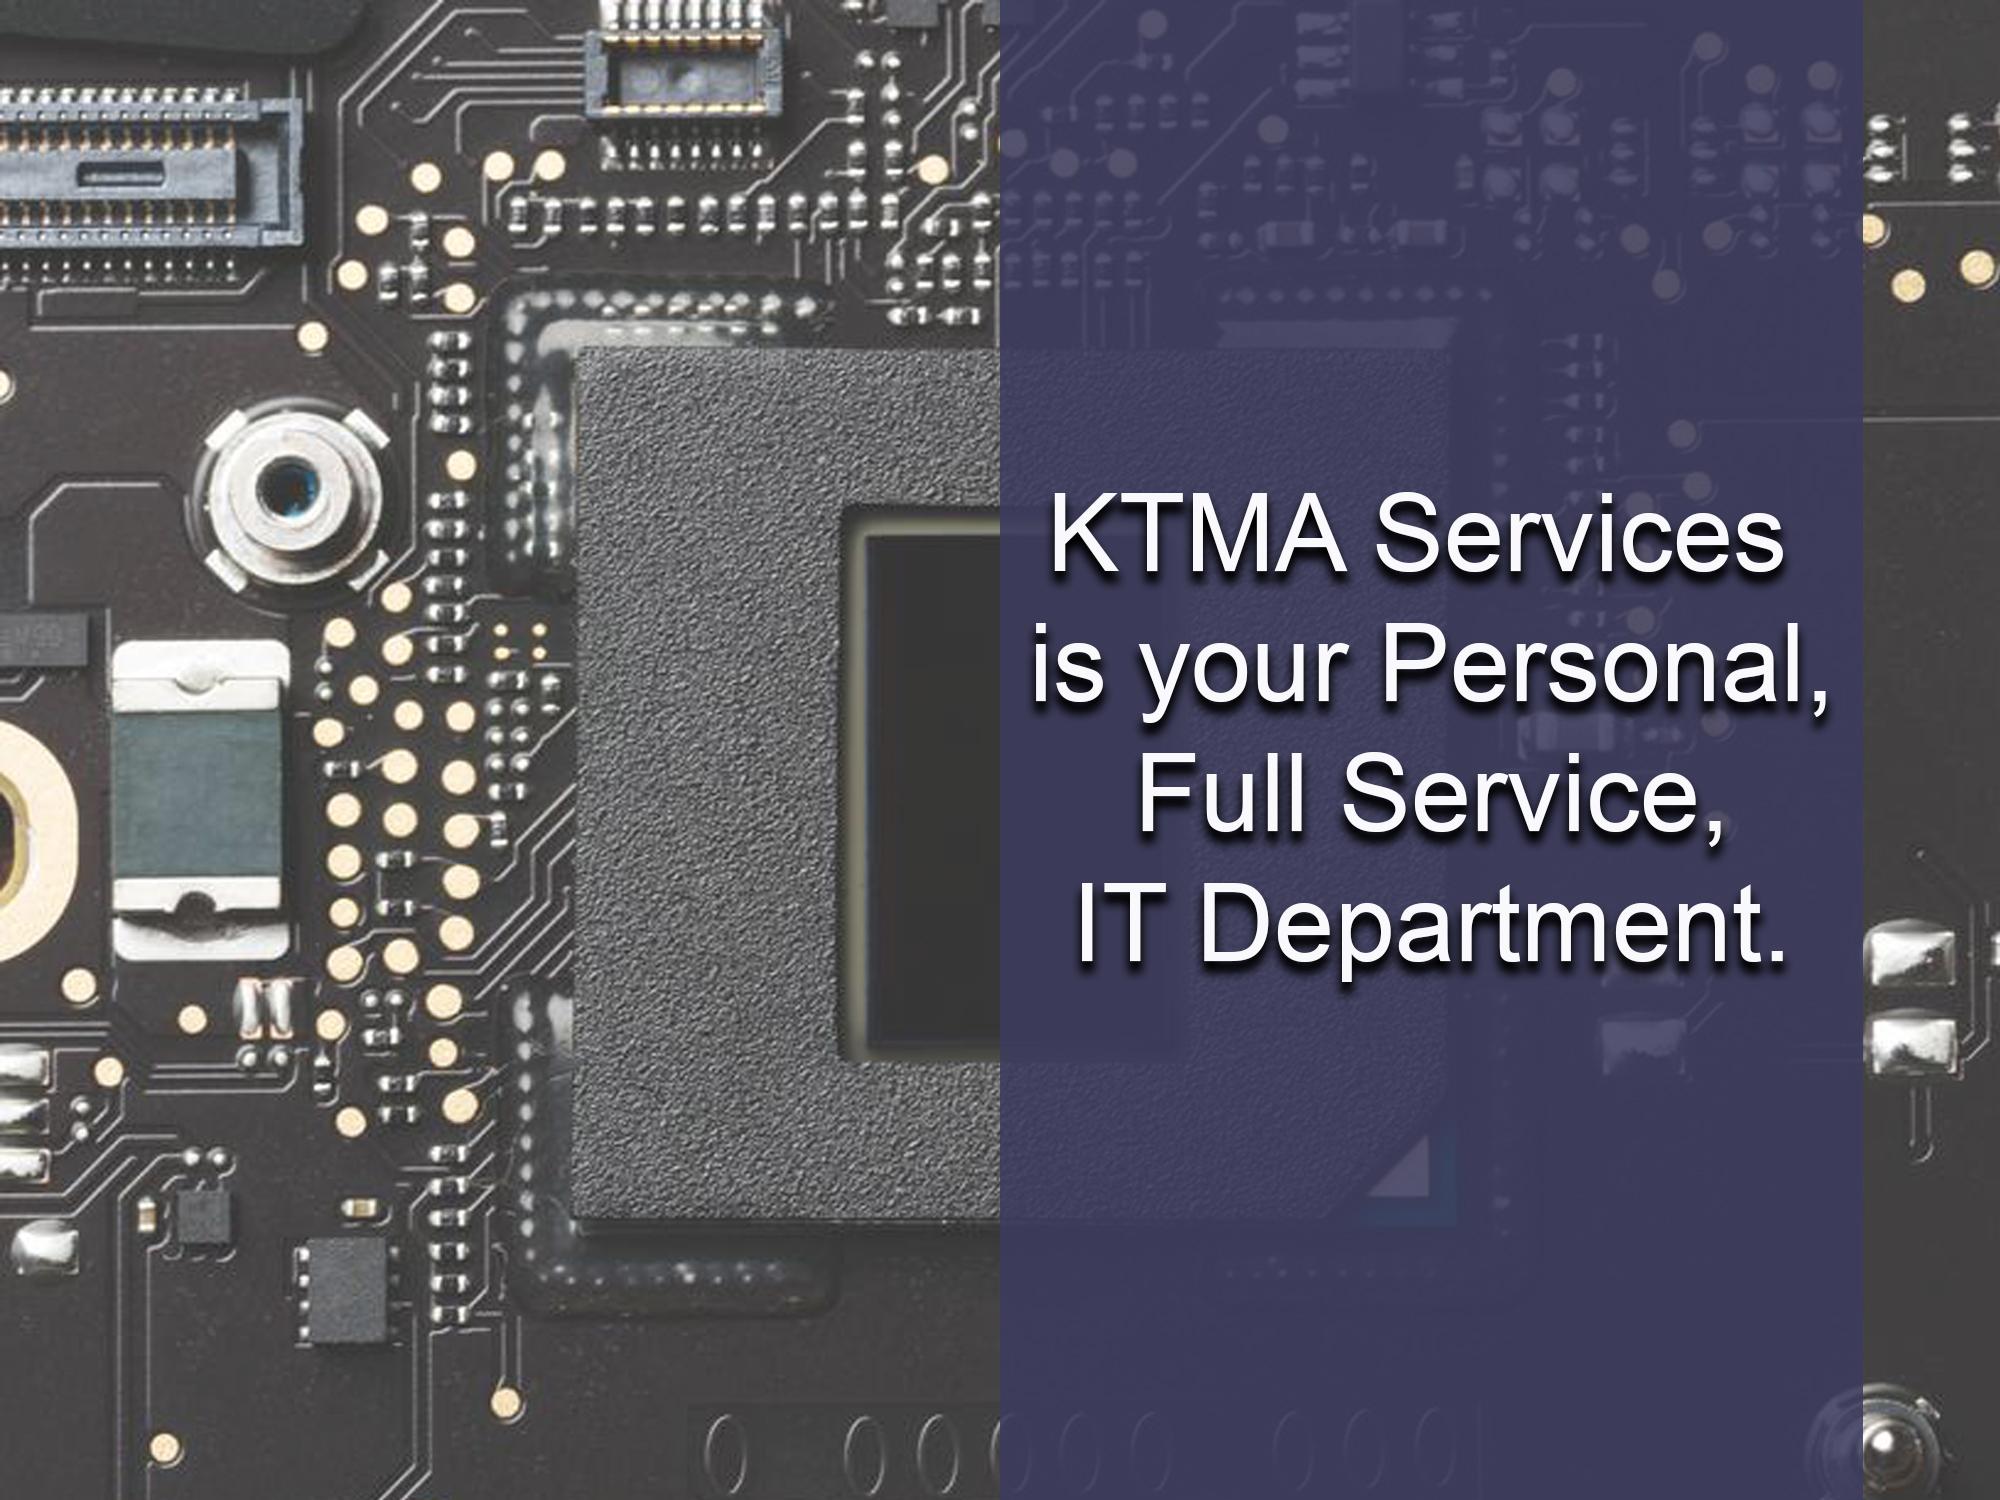 KTMA Services